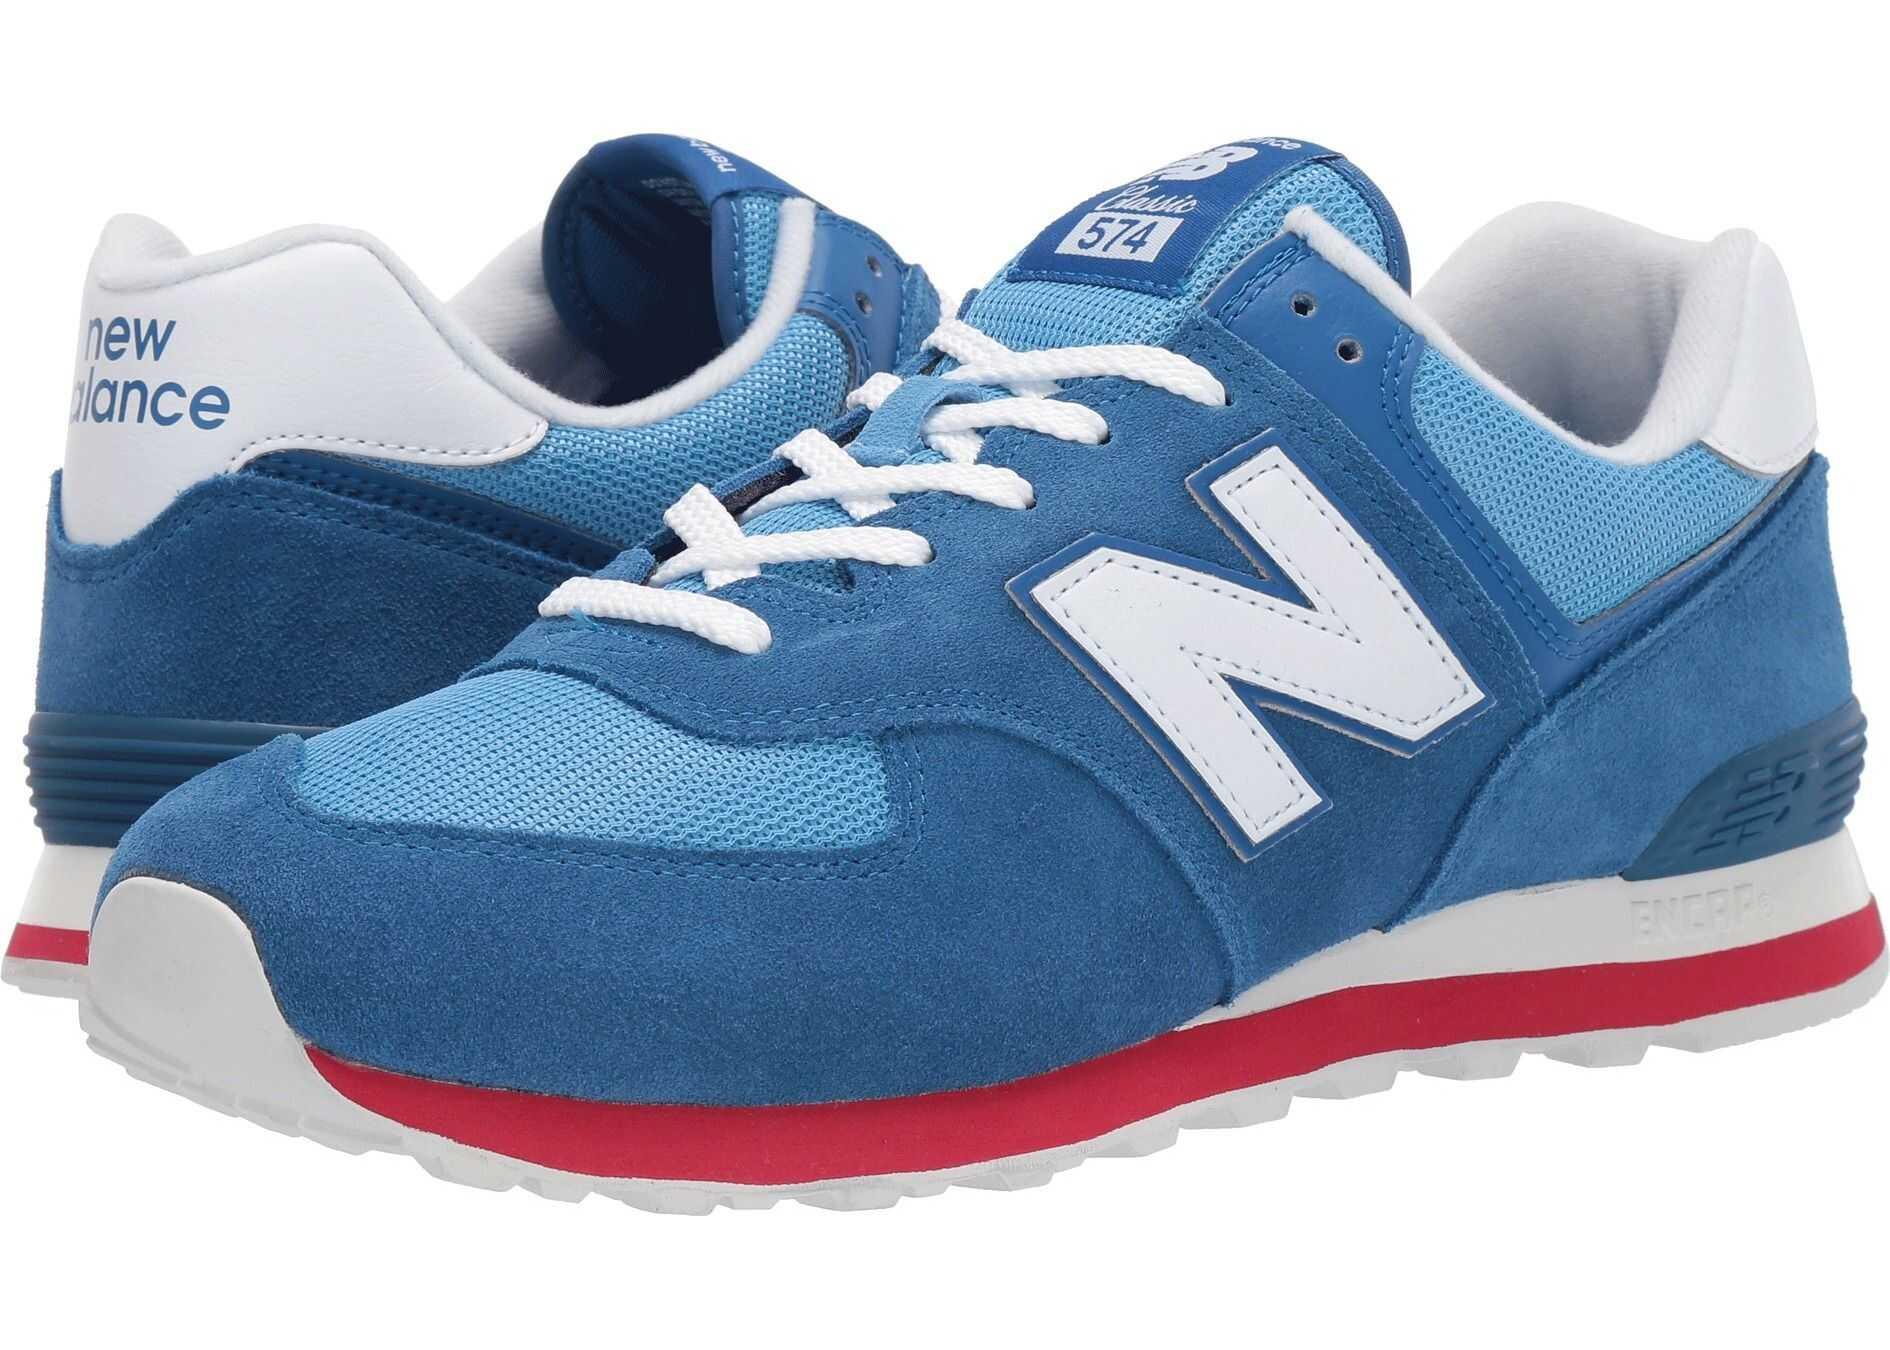 New Balance Classics ML574v2 Classic Blue/Team Red